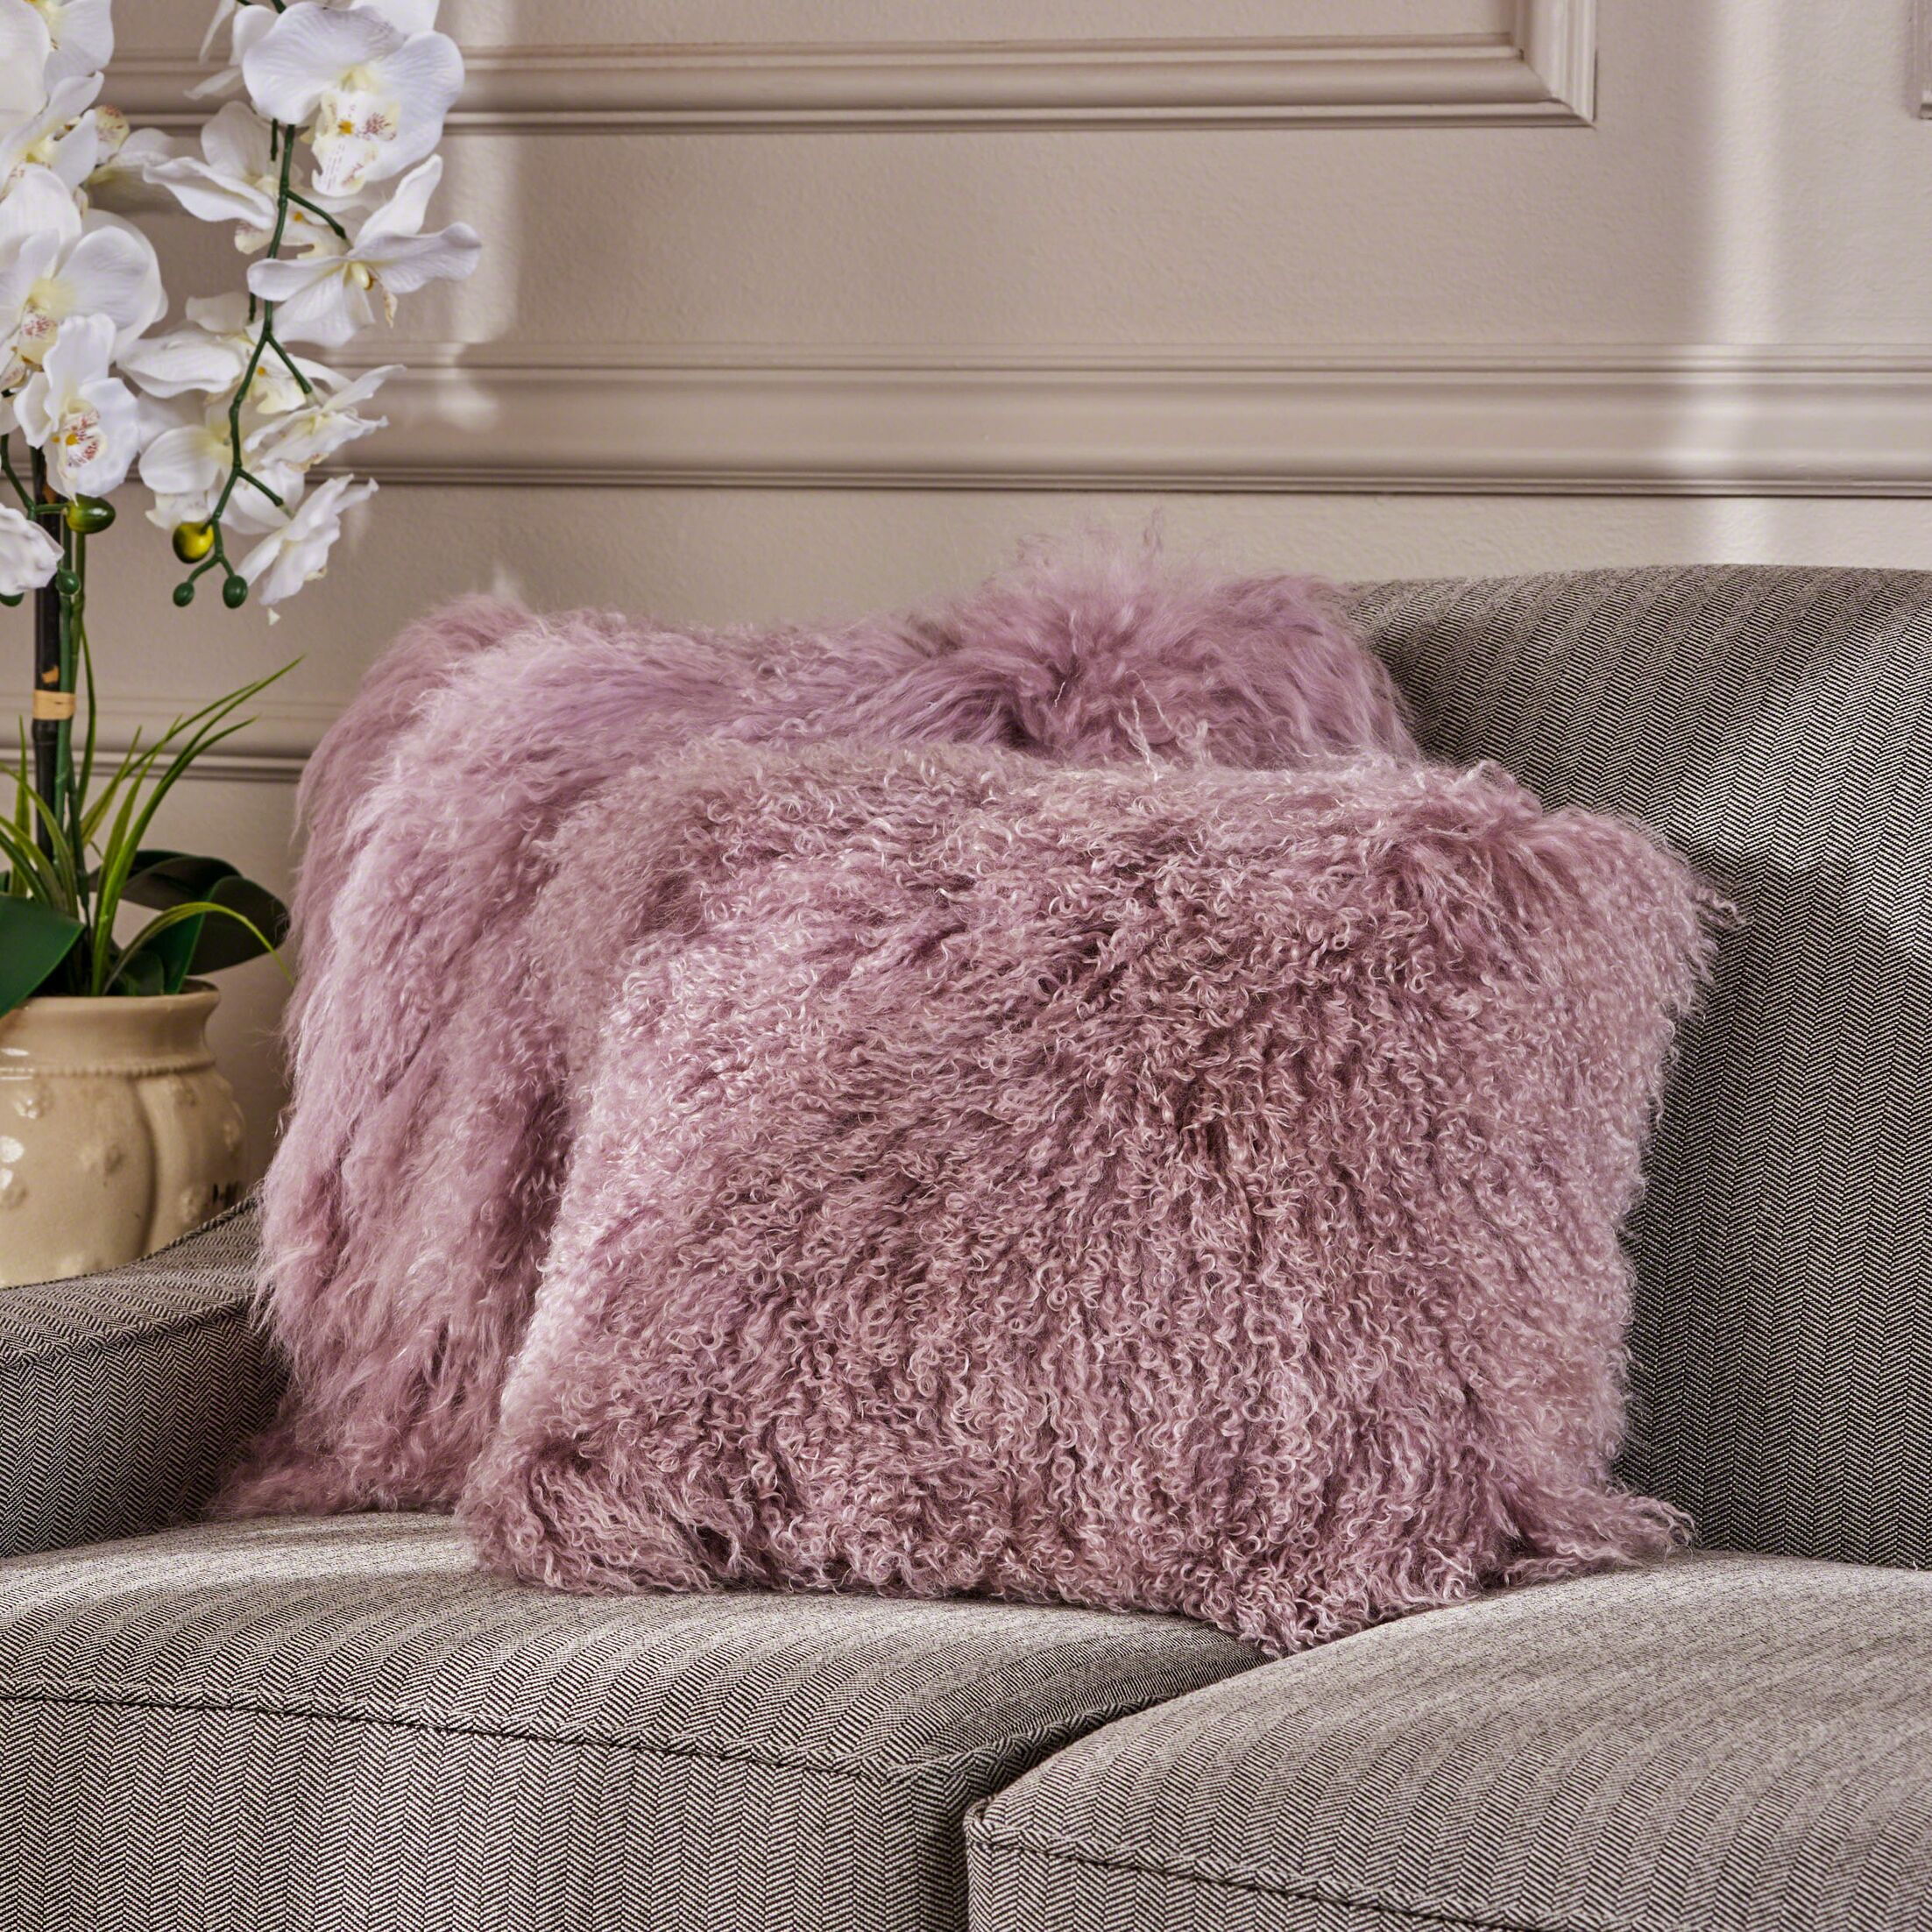 Kingstowne Shaggy Lamb Fur Throw Pillow Color: Light Purple, Size: 16